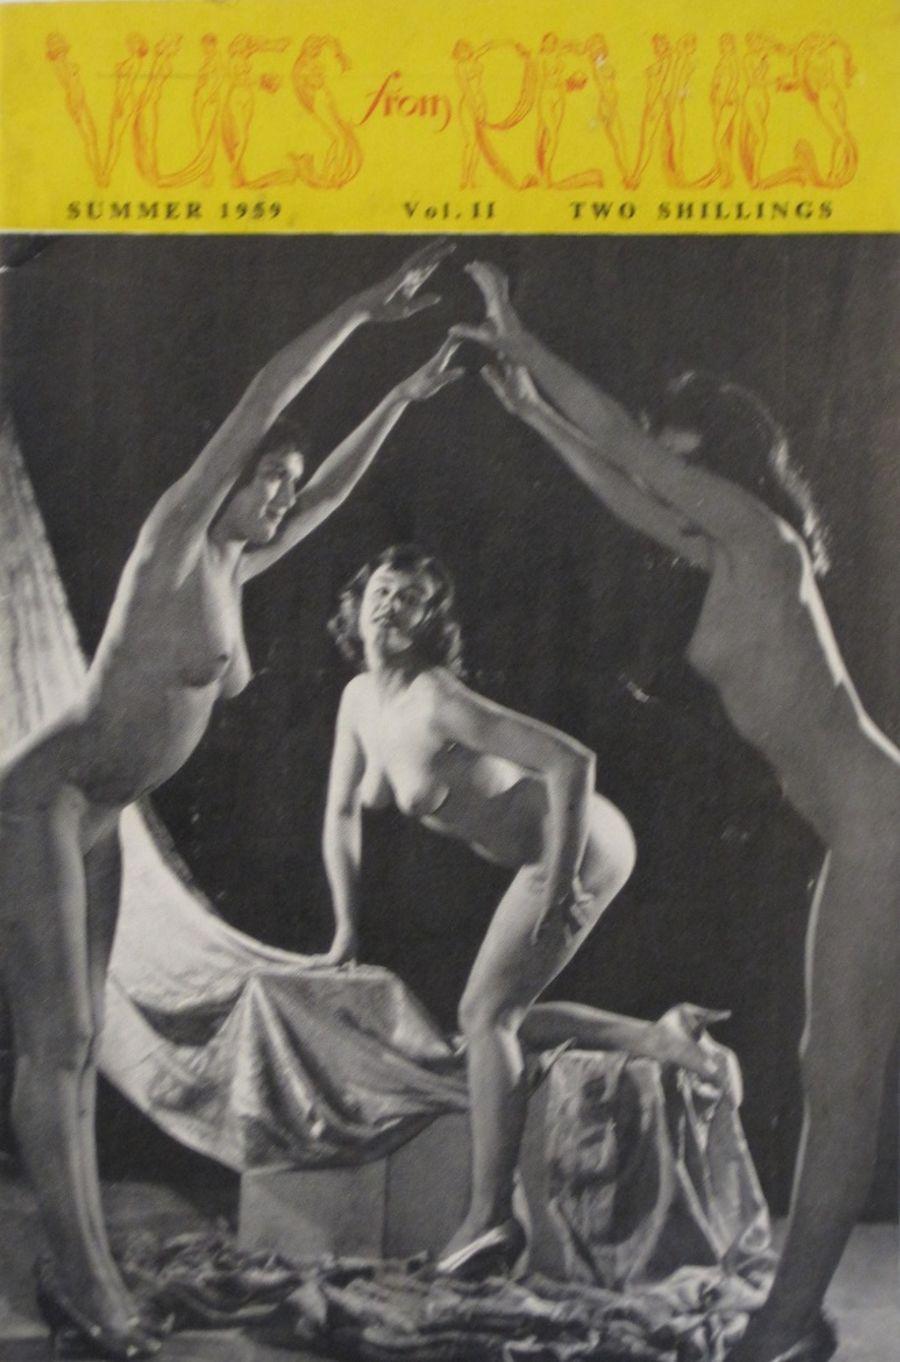 VUES FROM REVUES. VOL. 2. 1959 VINTAGE MEN'S POCKET MAGAZINE.